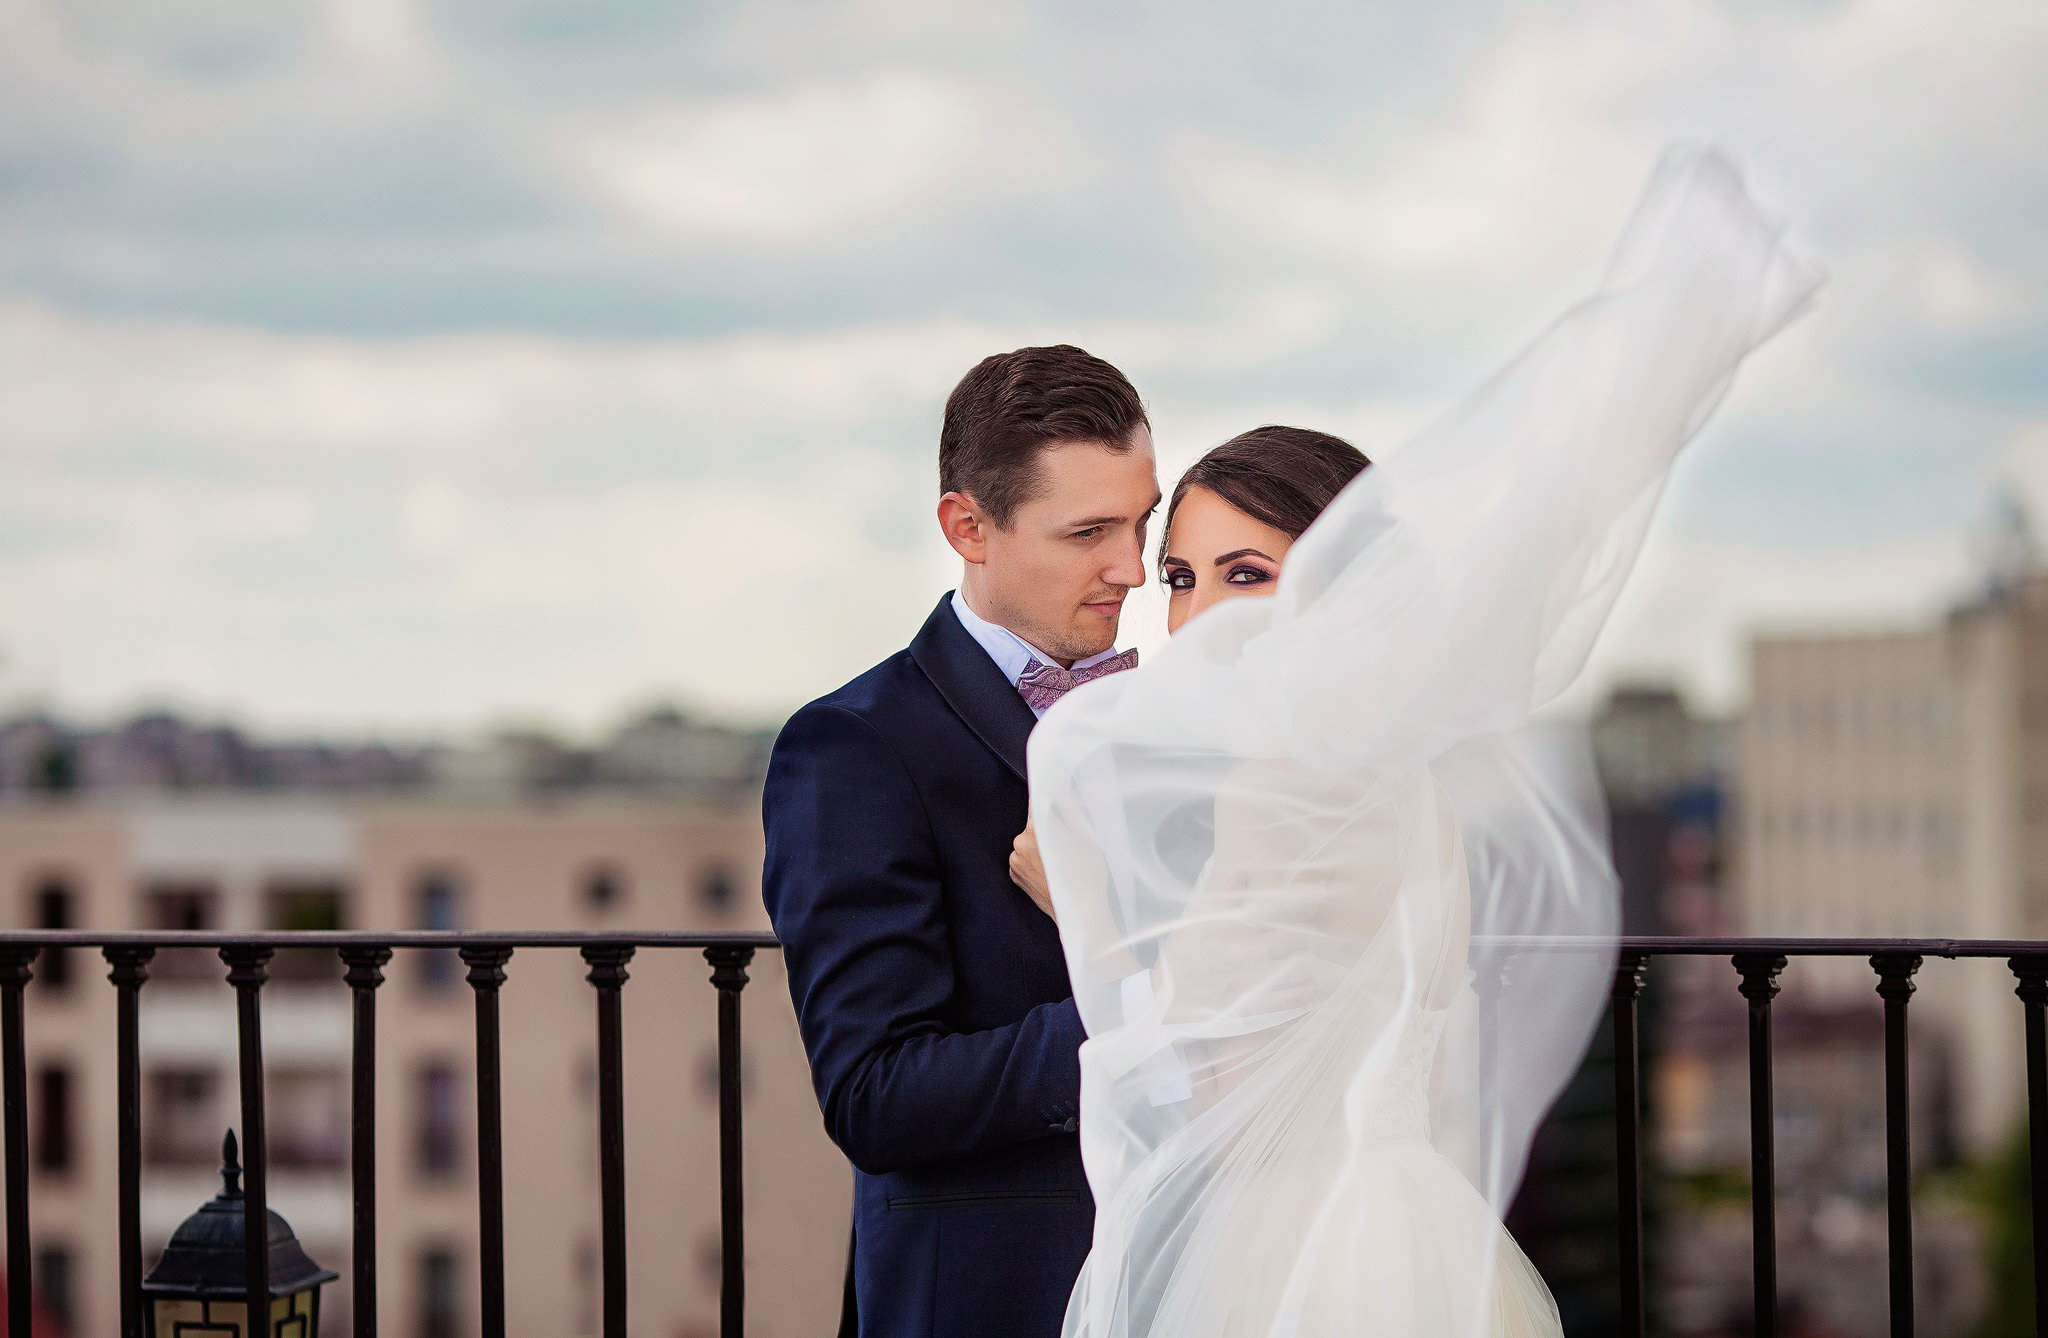 Ioana+ Bogdan, fotografie de nunta, fotograf Bucuresti, fotograf profesionist, wedding, sedinta foto, fotografie creativa, nunta